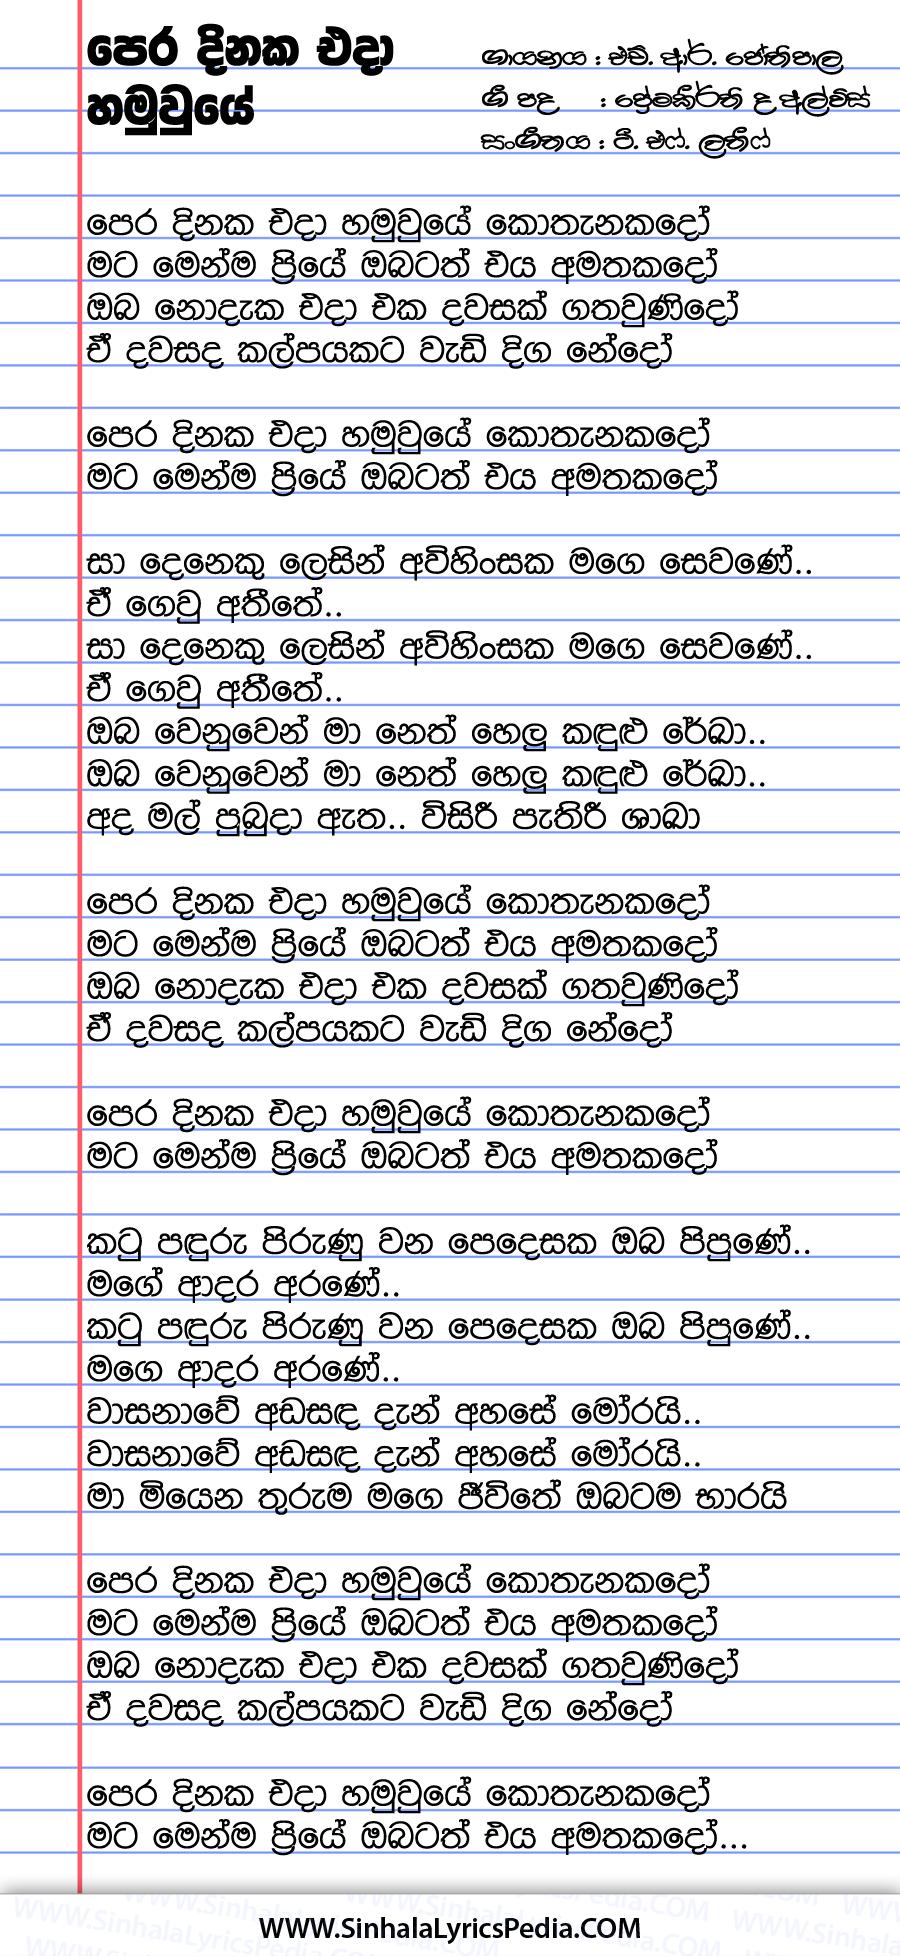 Pera Dinaka Eda Hamuwuye Kothanakado Song Lyrics